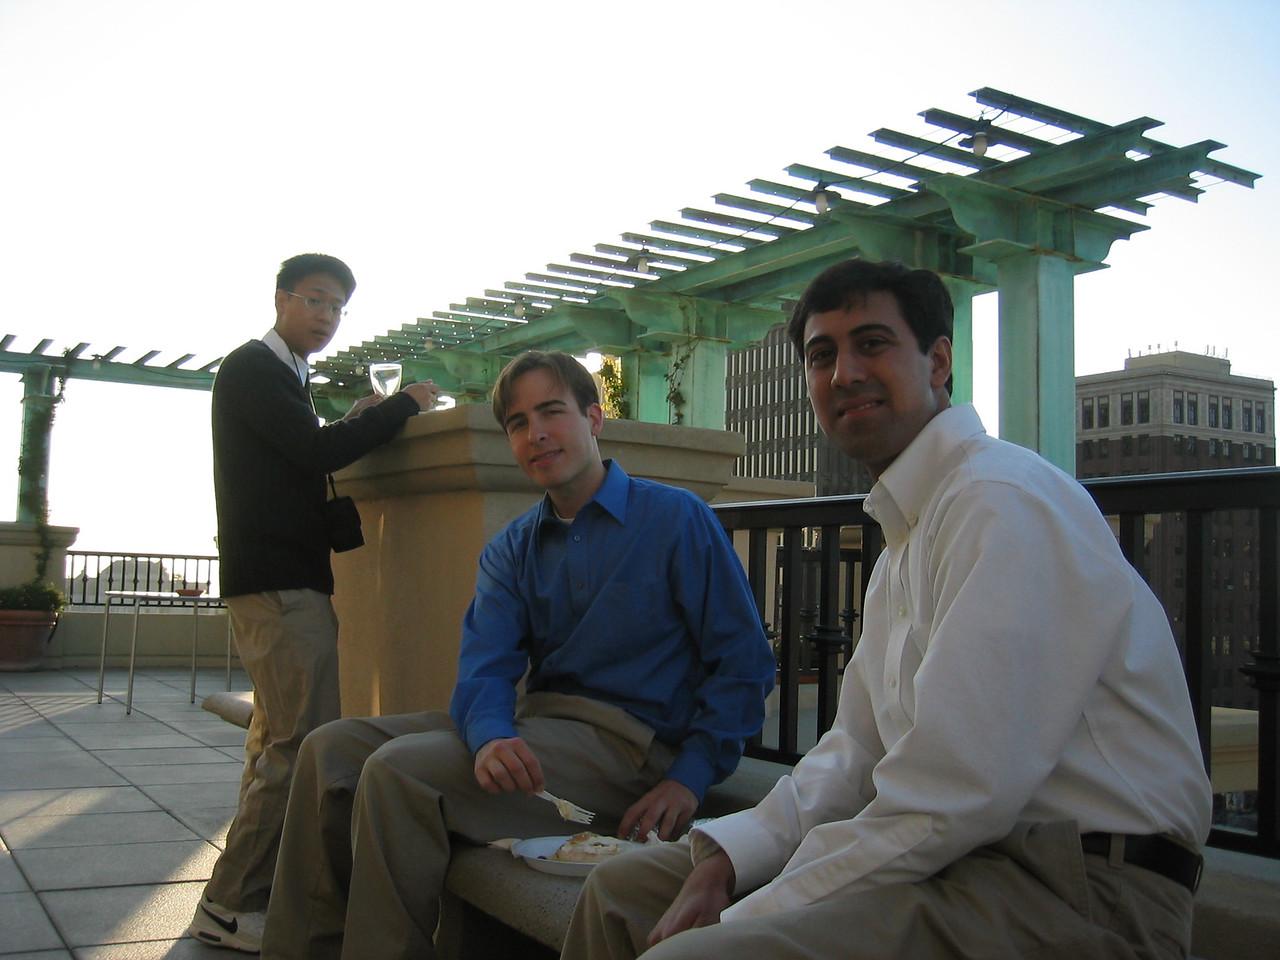 The men of outdoors 2 - Phil, Sean, & Sandeep